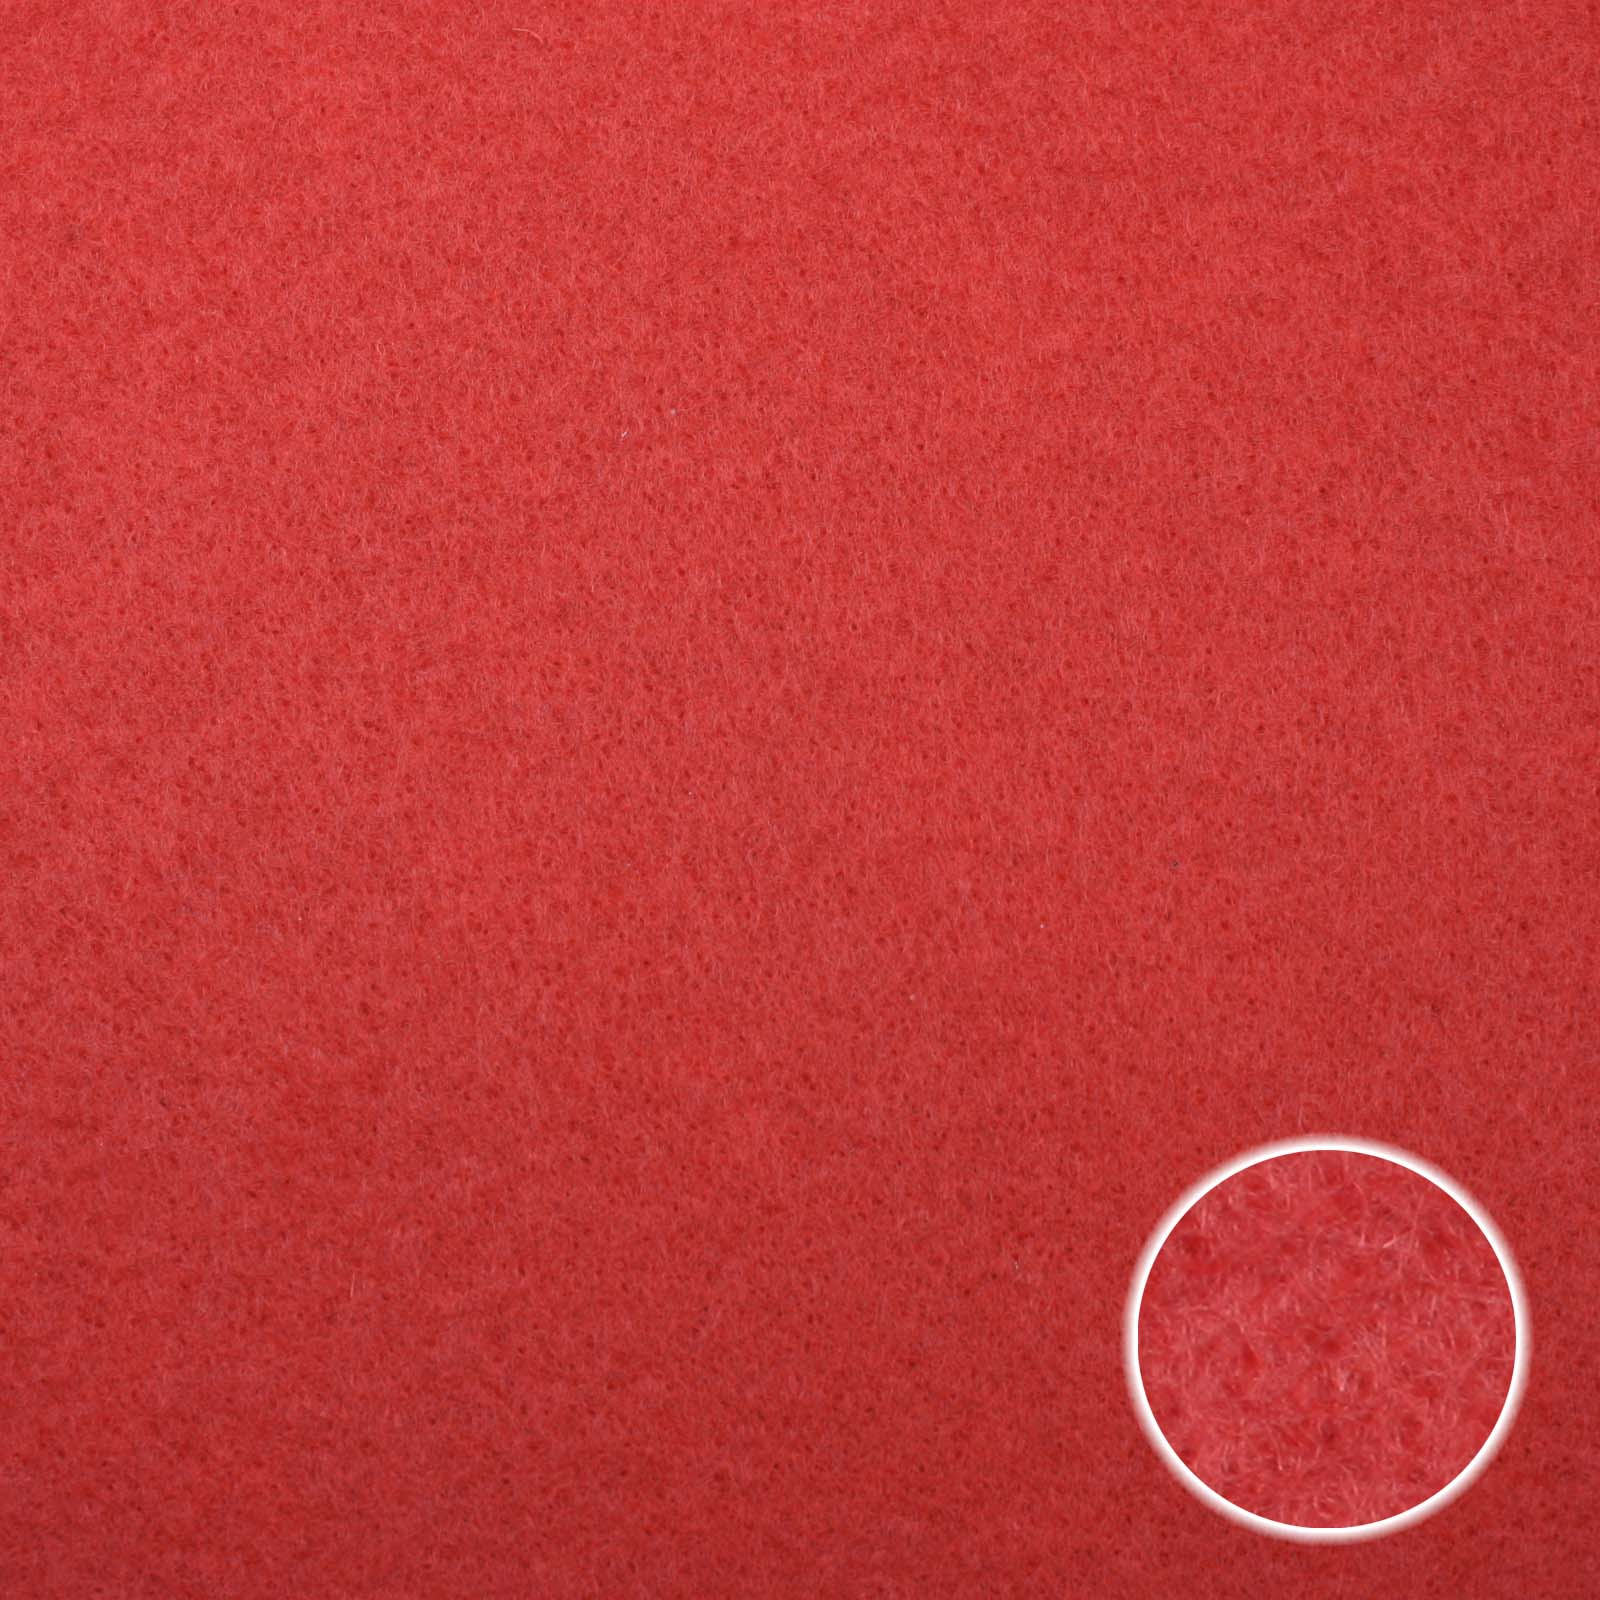 Teppichfliese Nadelfilz 40x40cm selbstklebend